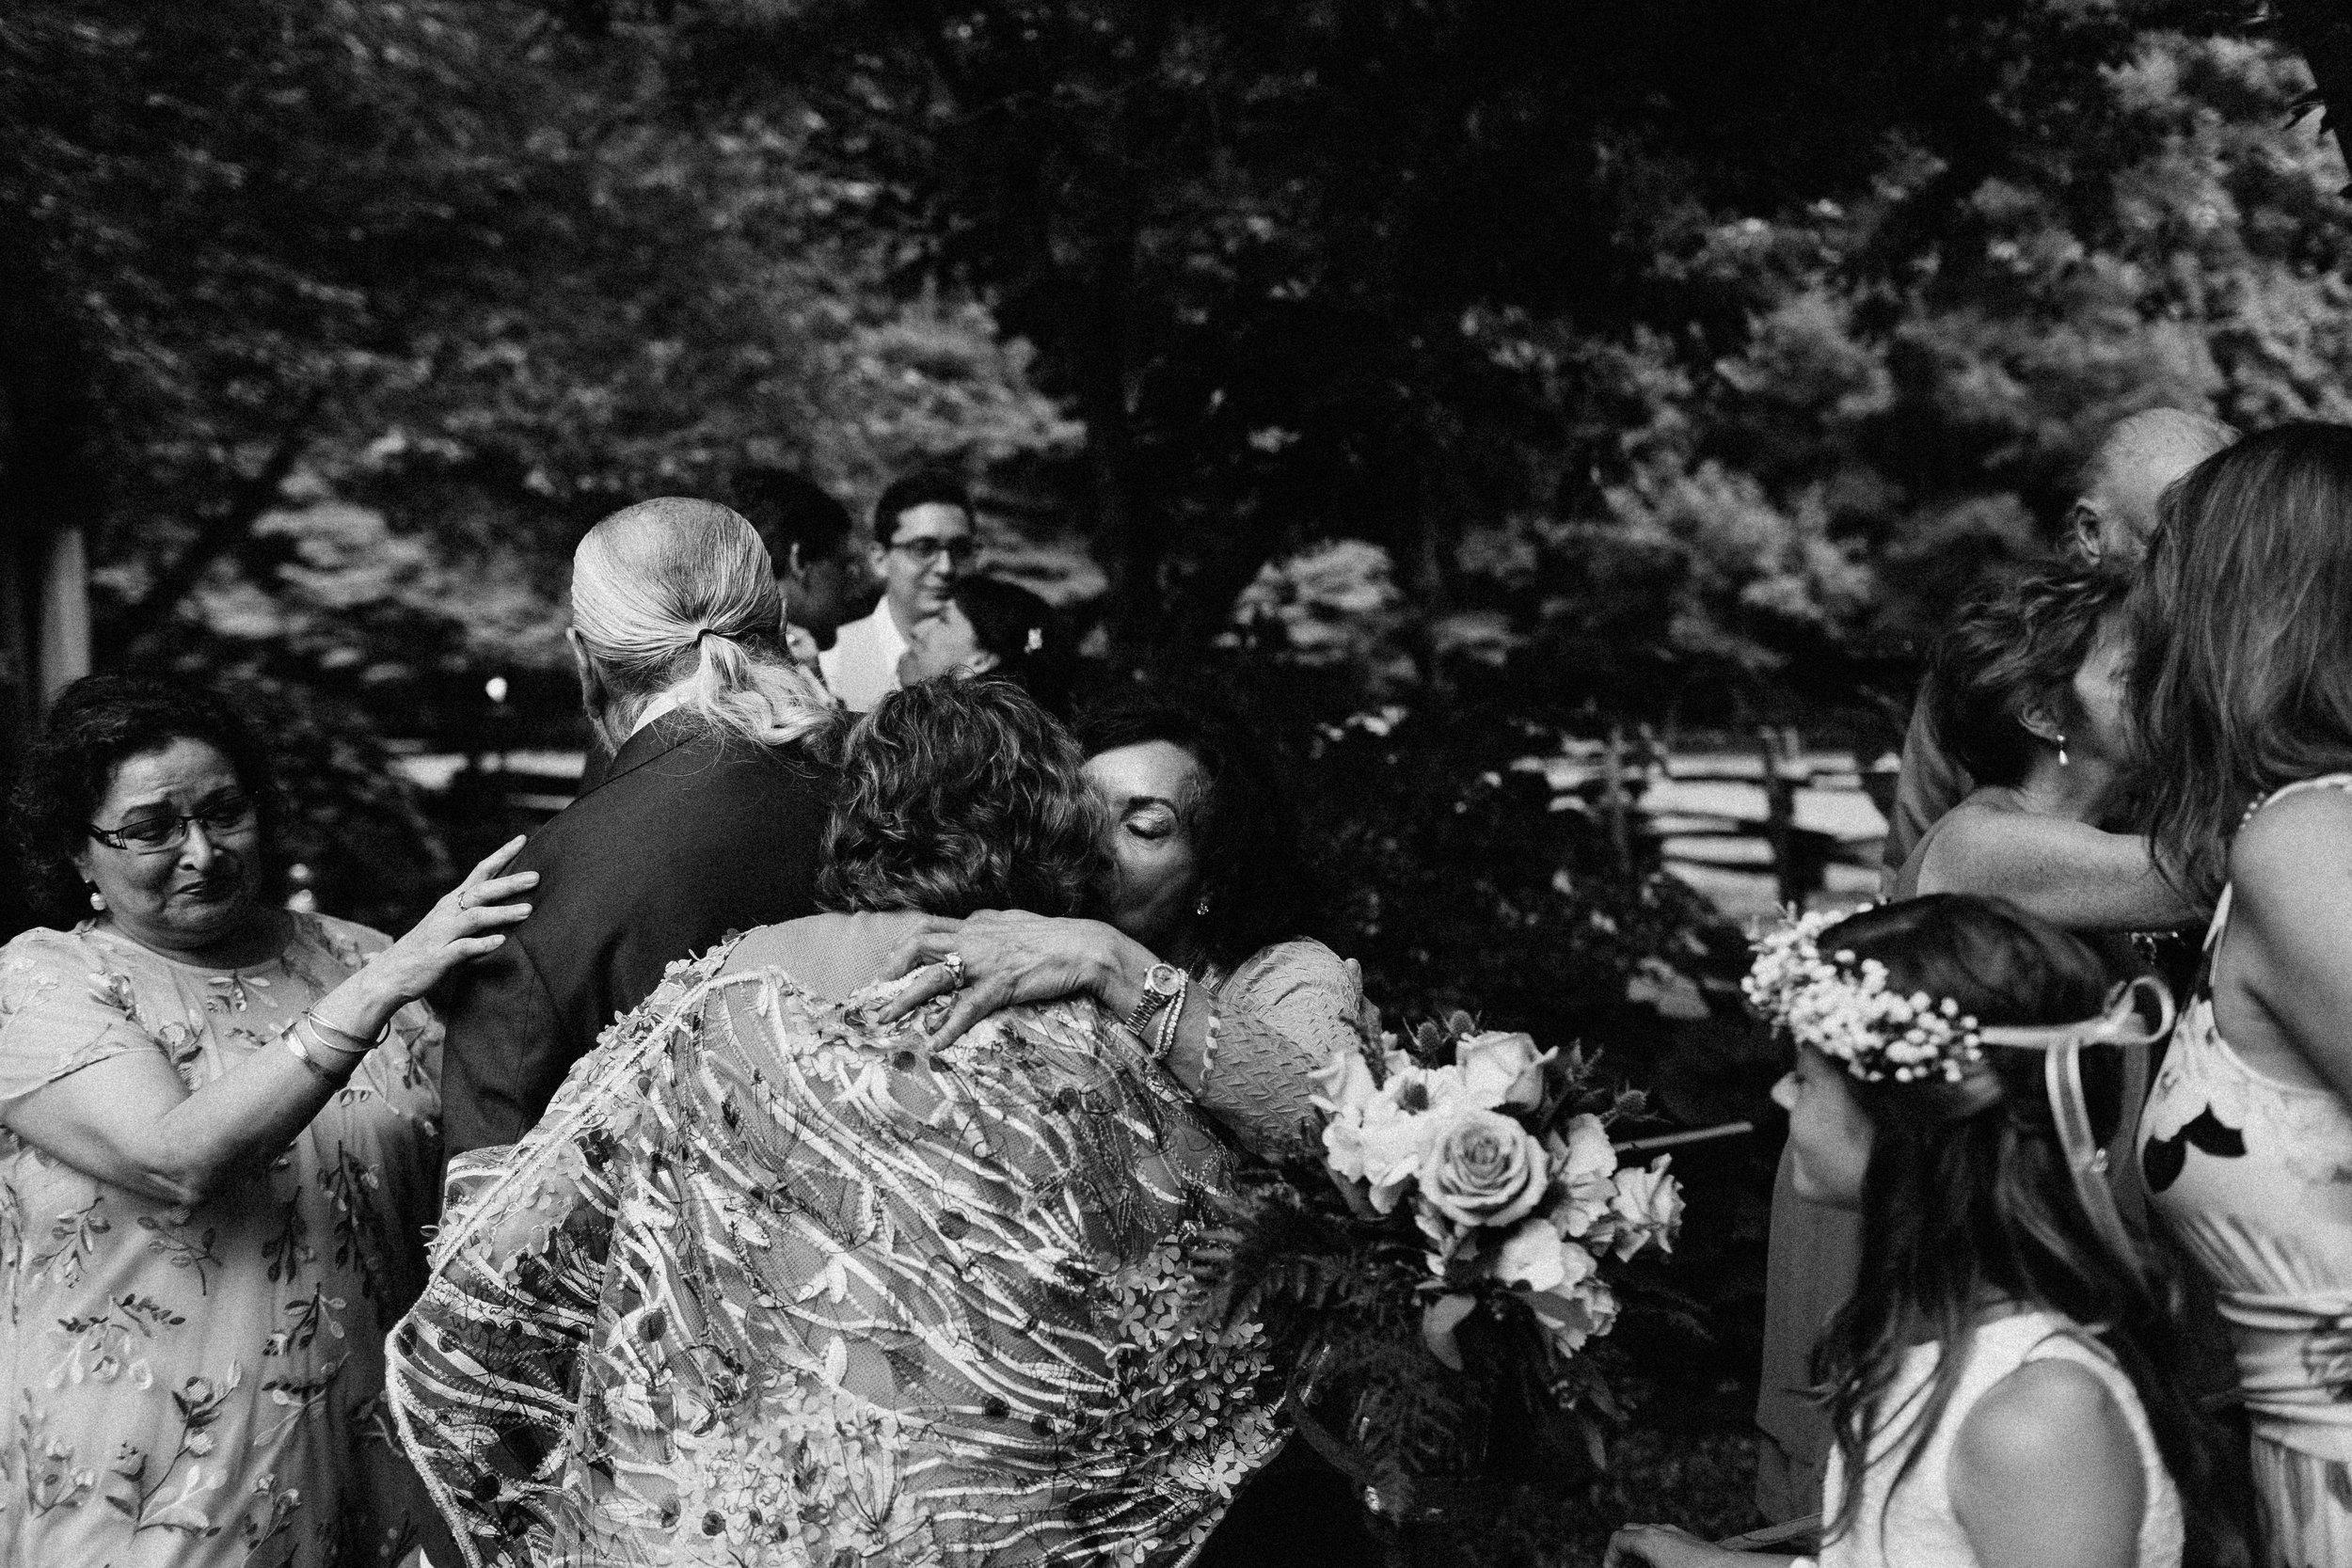 neverland_farms_atlanta_wedding_photographer_documentary_river_west_1806.jpg